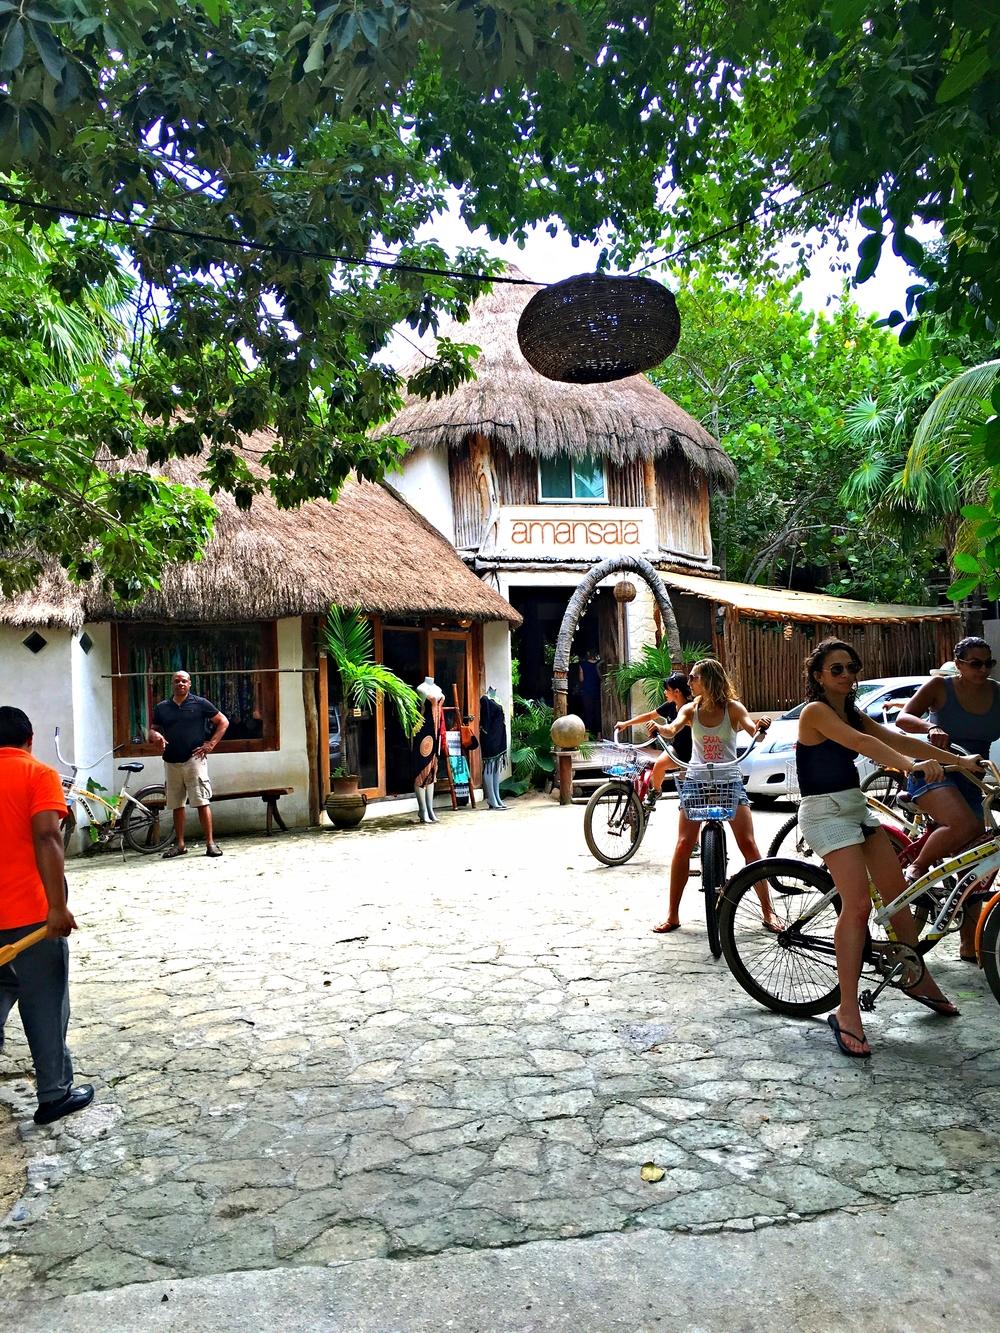 Street entrance to Amansala - bikes everywhere!